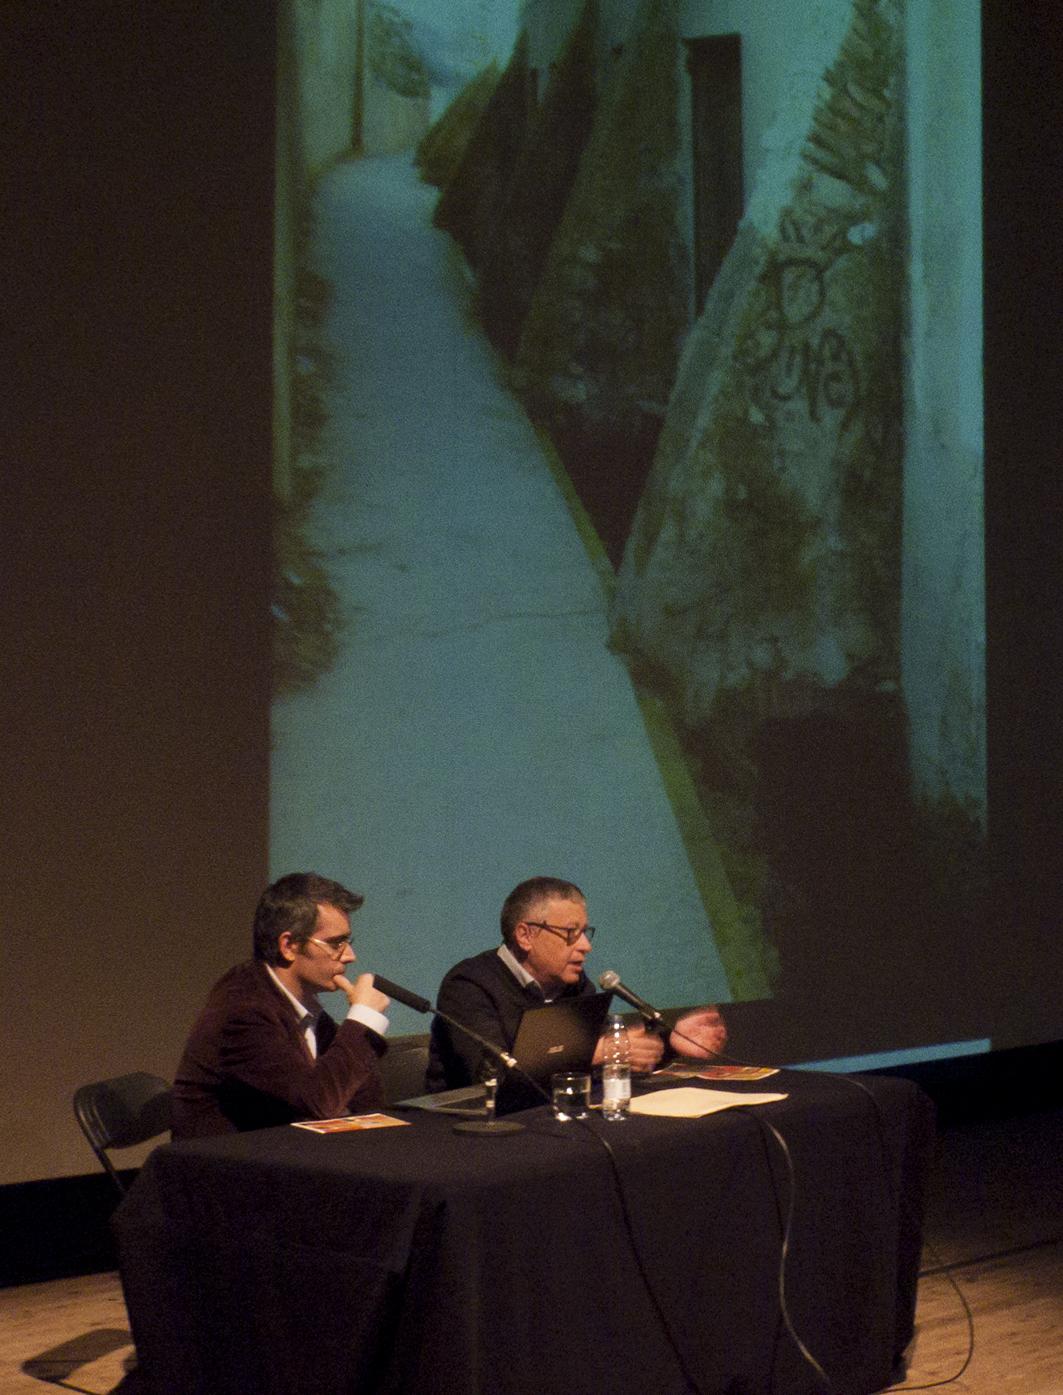 Jordi Ribaudí i Jaume Ortínez 9.12.13